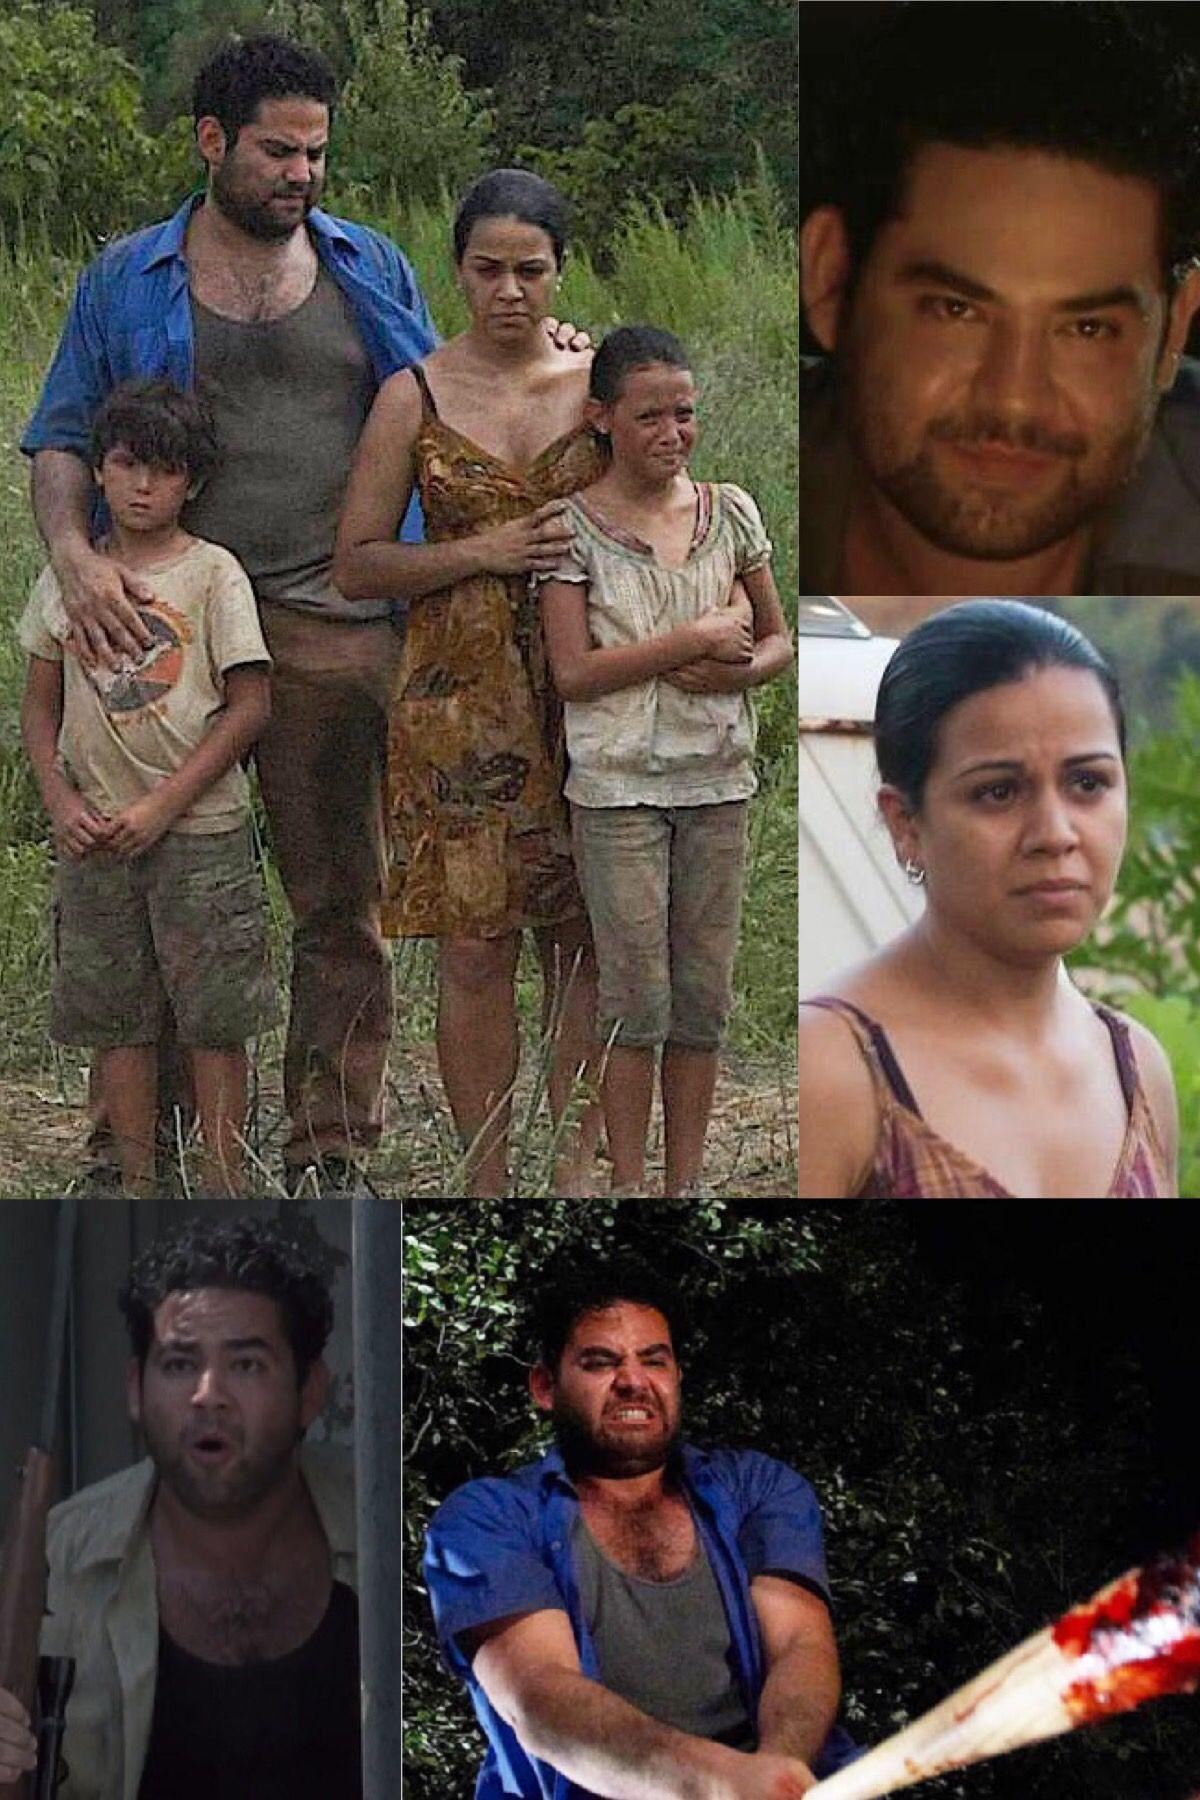 Morales The Walking Dead : morales, walking, Morales,, Miranda, Morales, (wife),, Eliza, (Daughter),, Louis, (Son), (Camp), Walking, Dead,, Memes